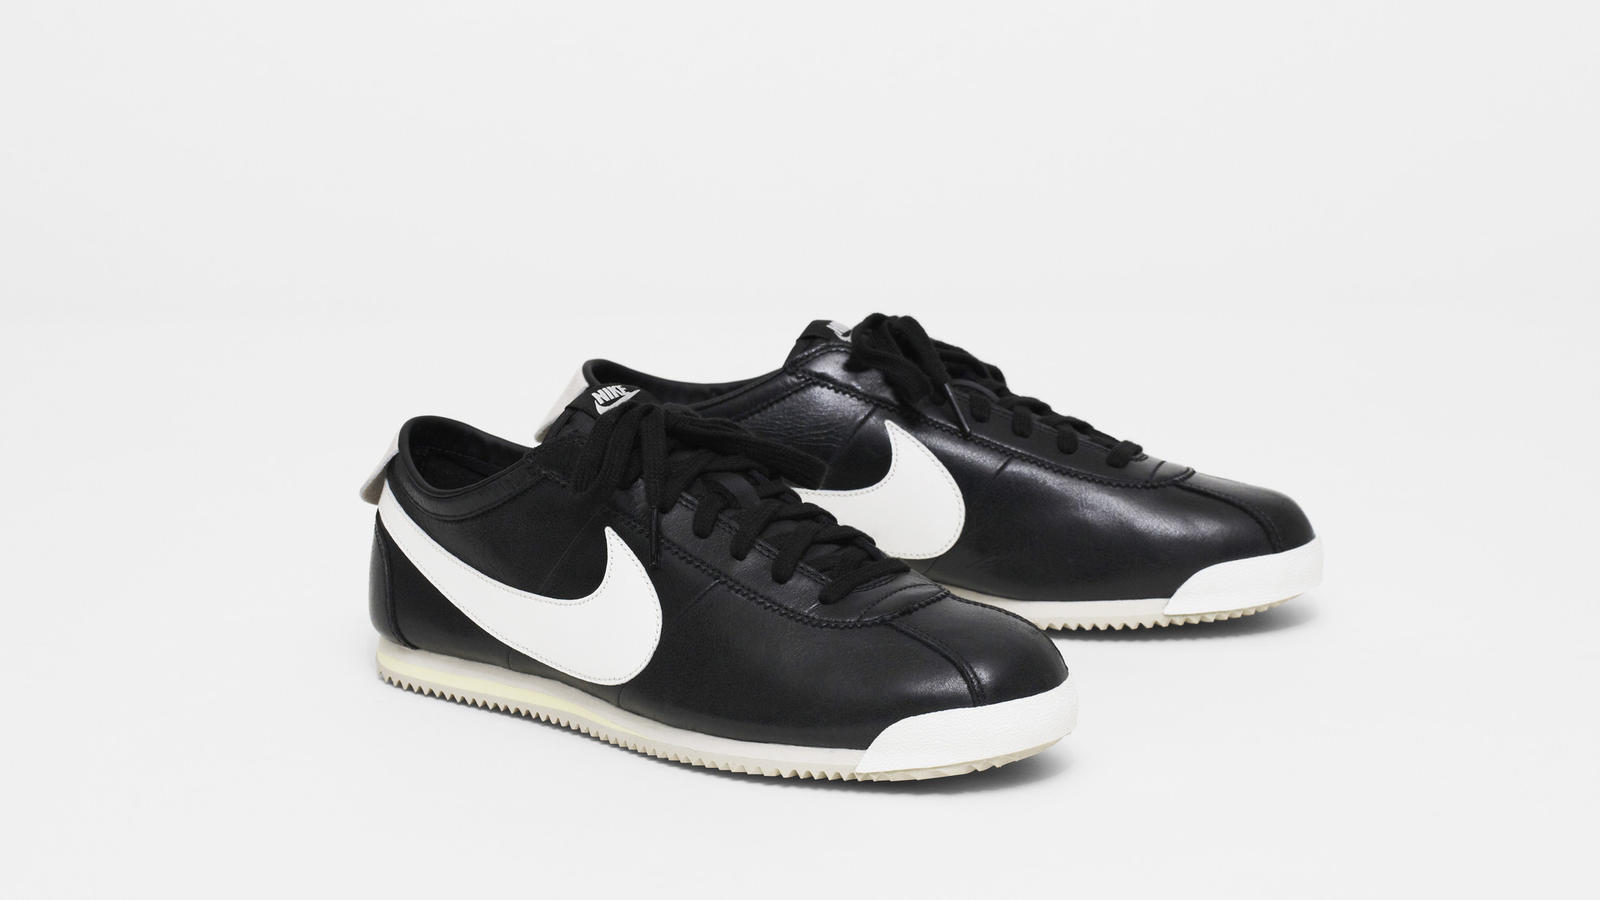 Nike Sportswear Spring 2012 Running Collection Nike News